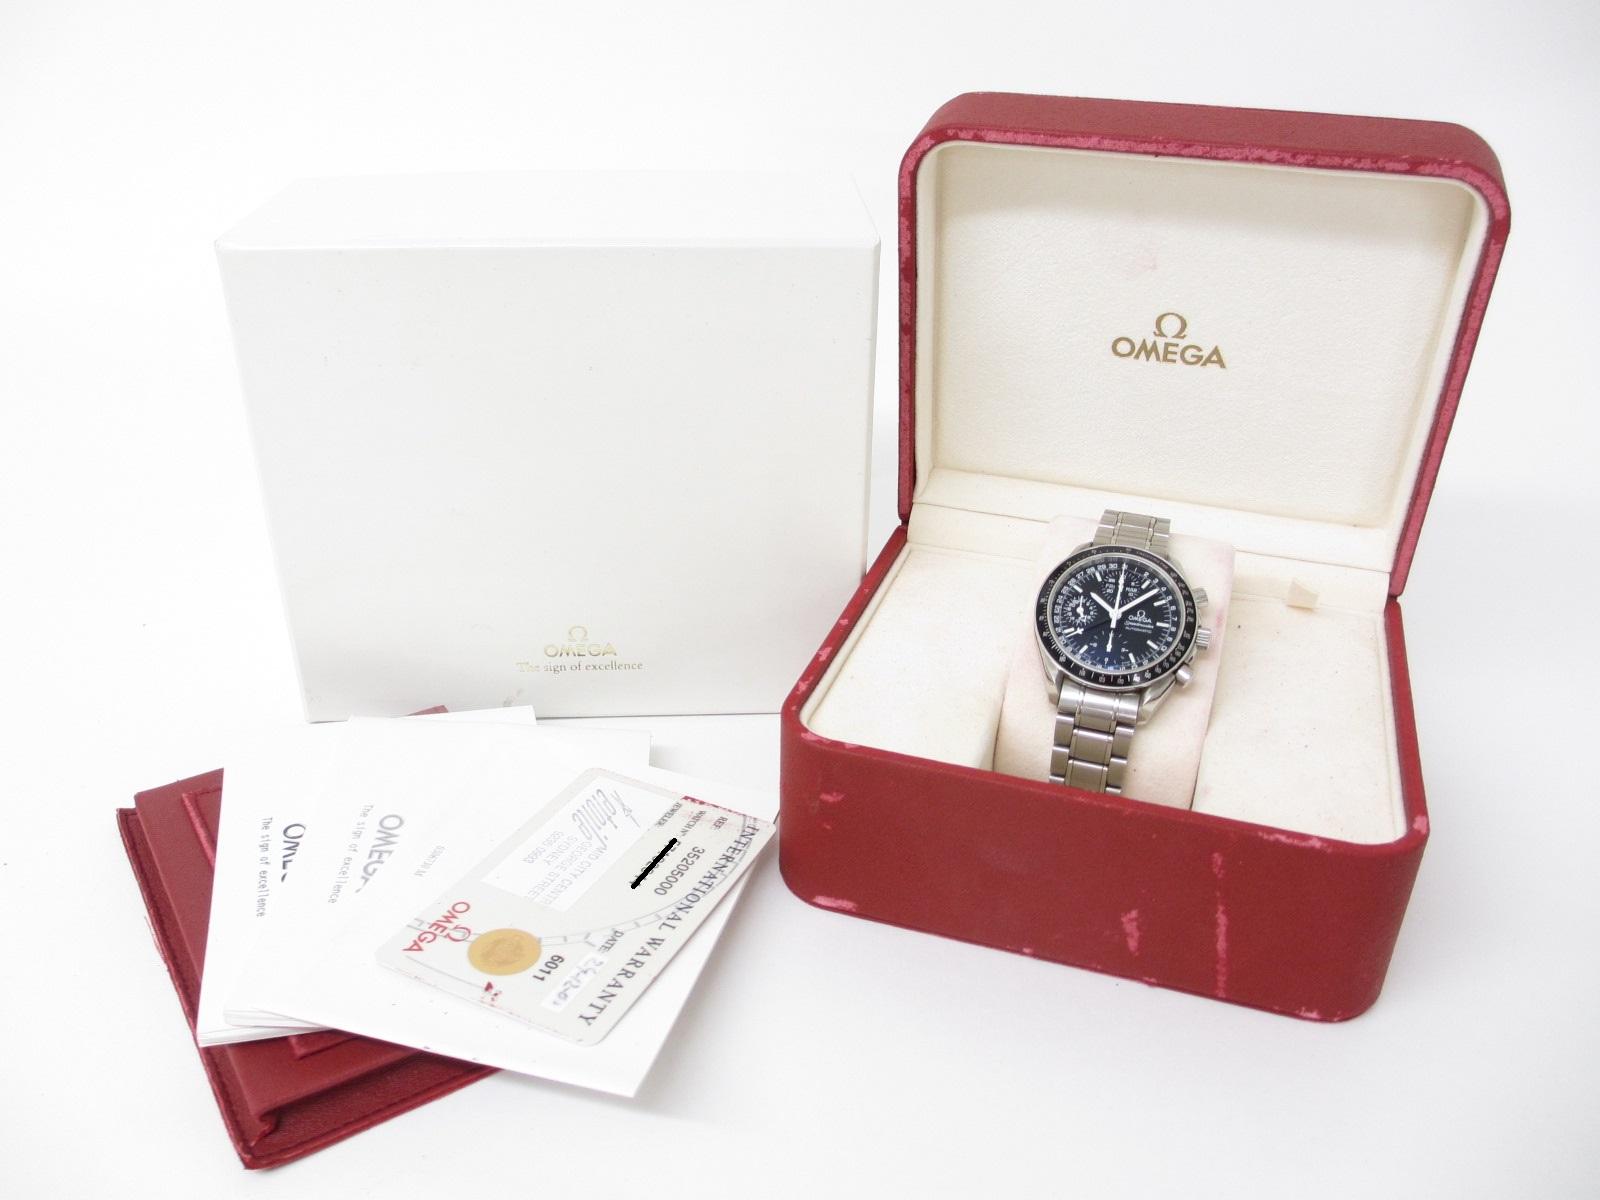 OMEGA オメガ スピードマスター トリプルカレンダー デイデイト マーク40 3520-50 メンズ腕時計